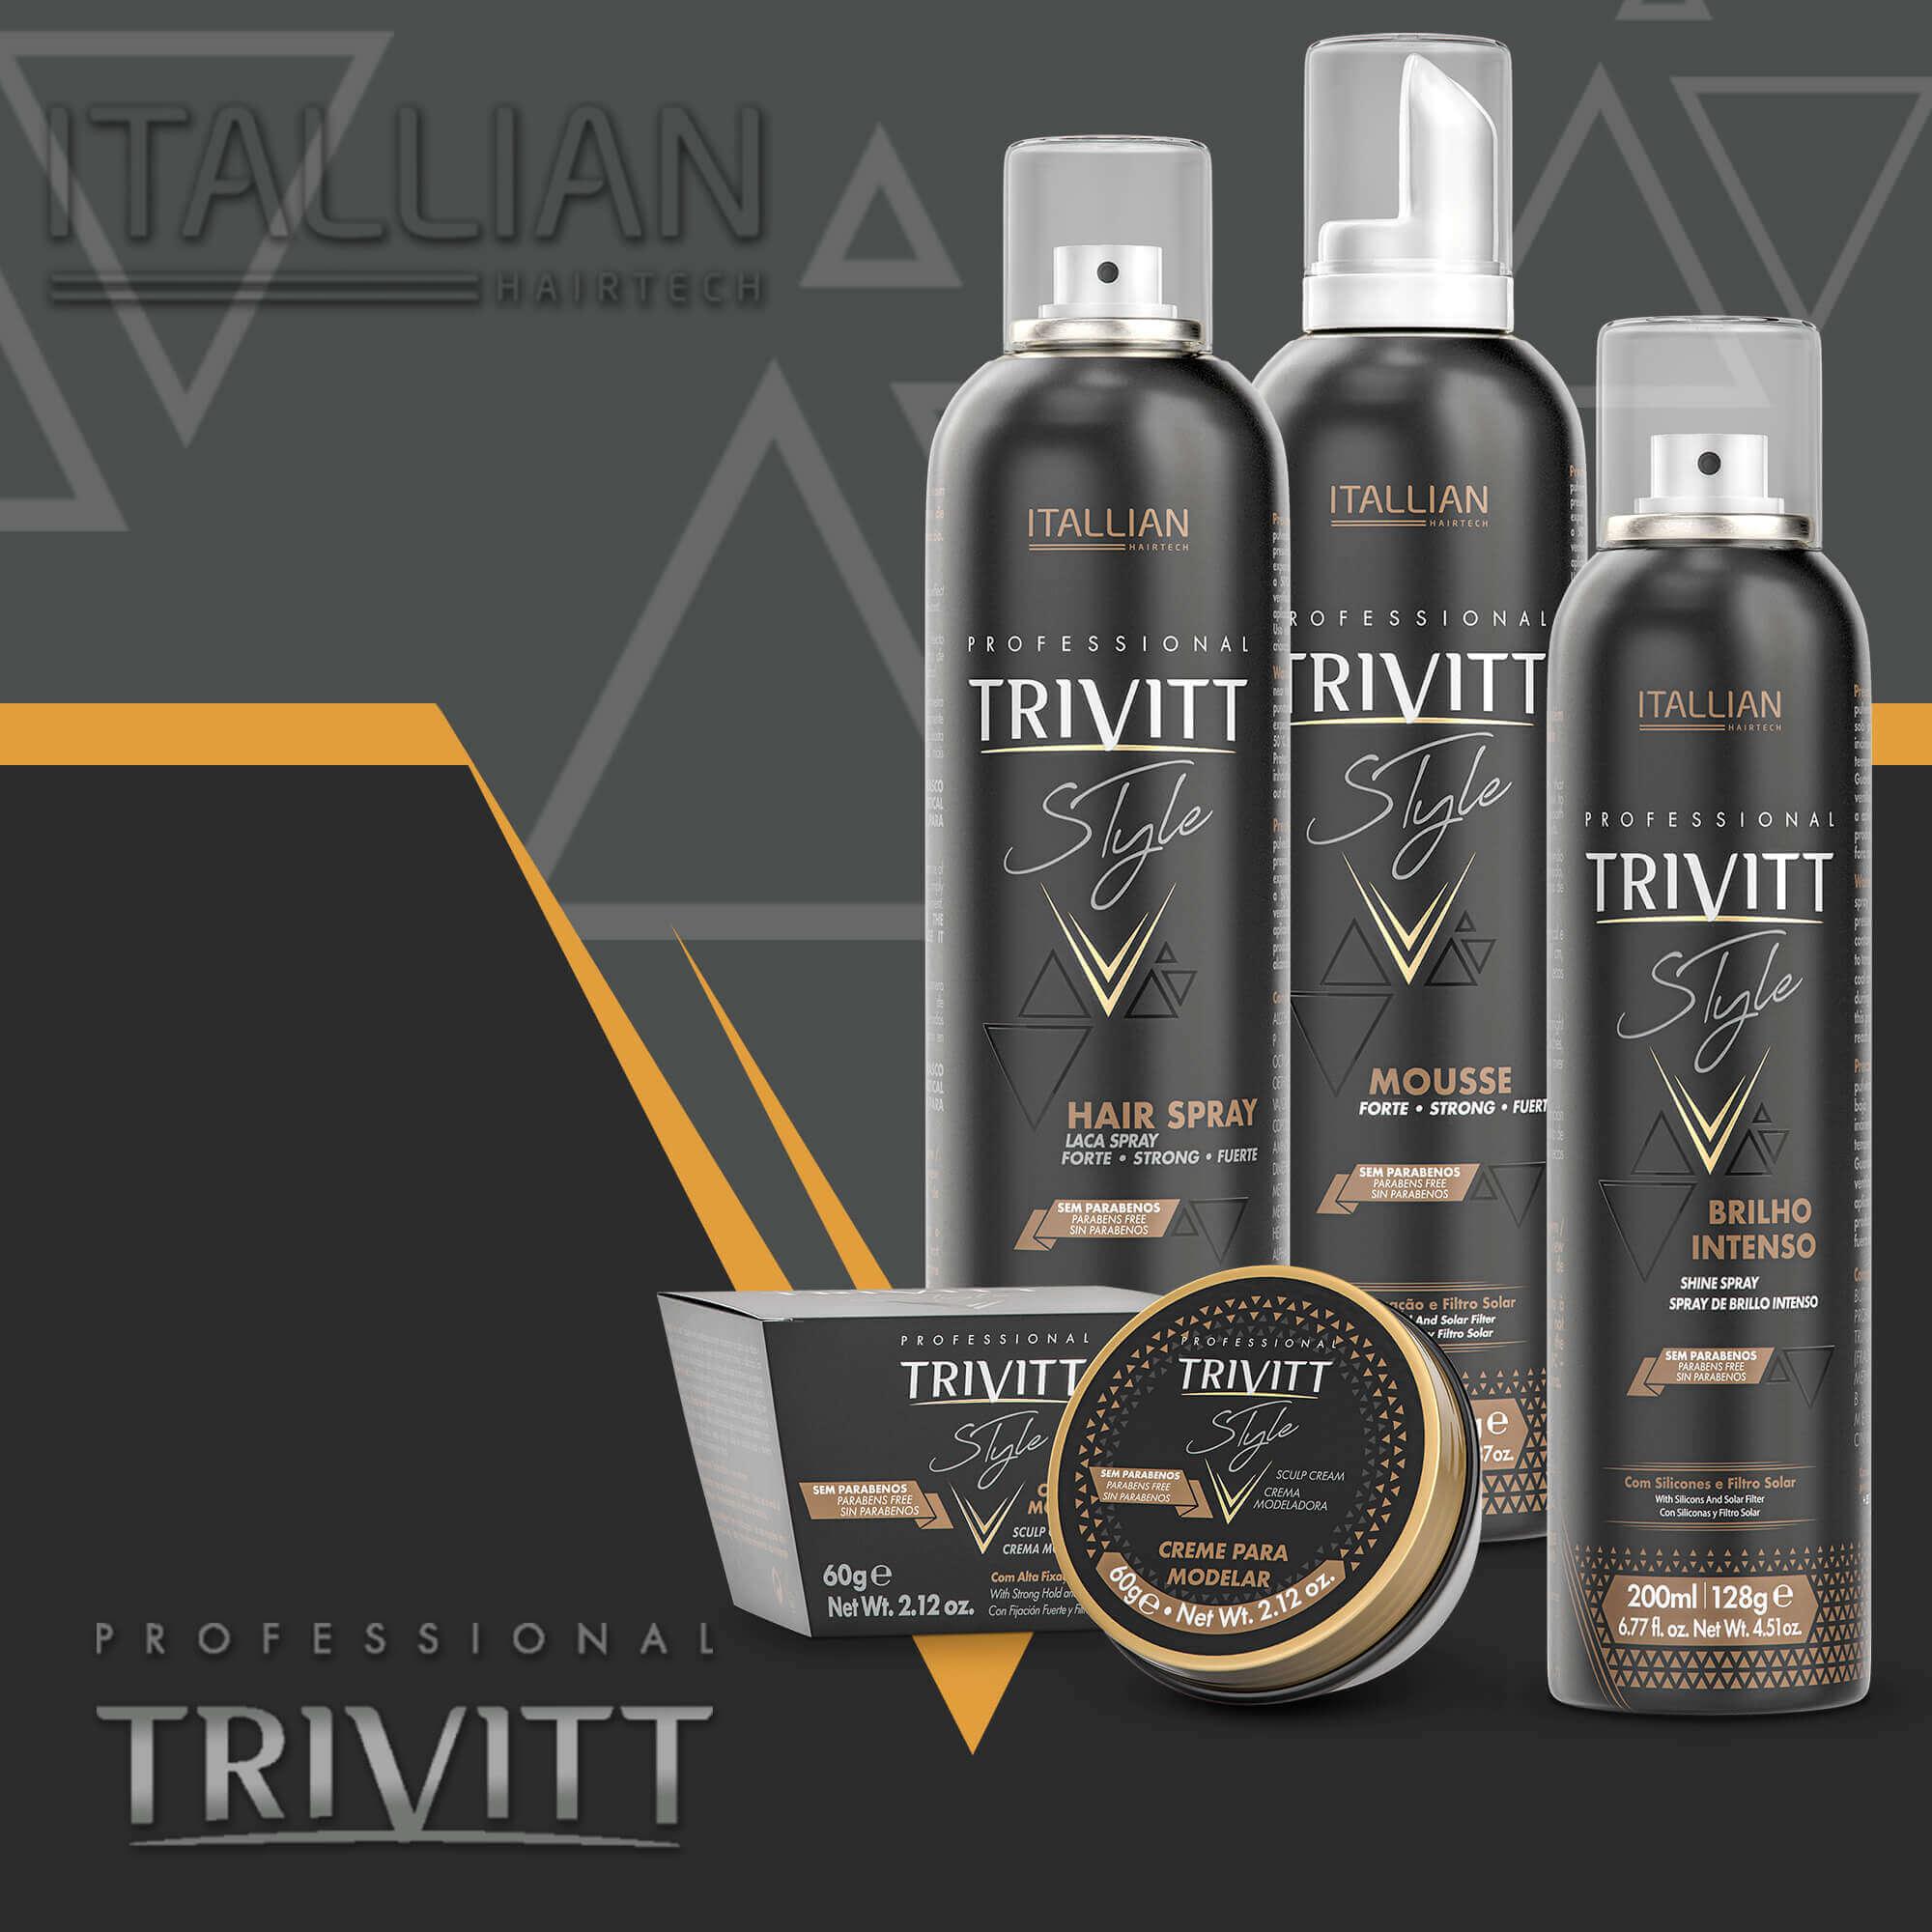 Kit Finalidadores Itallian Trivitt